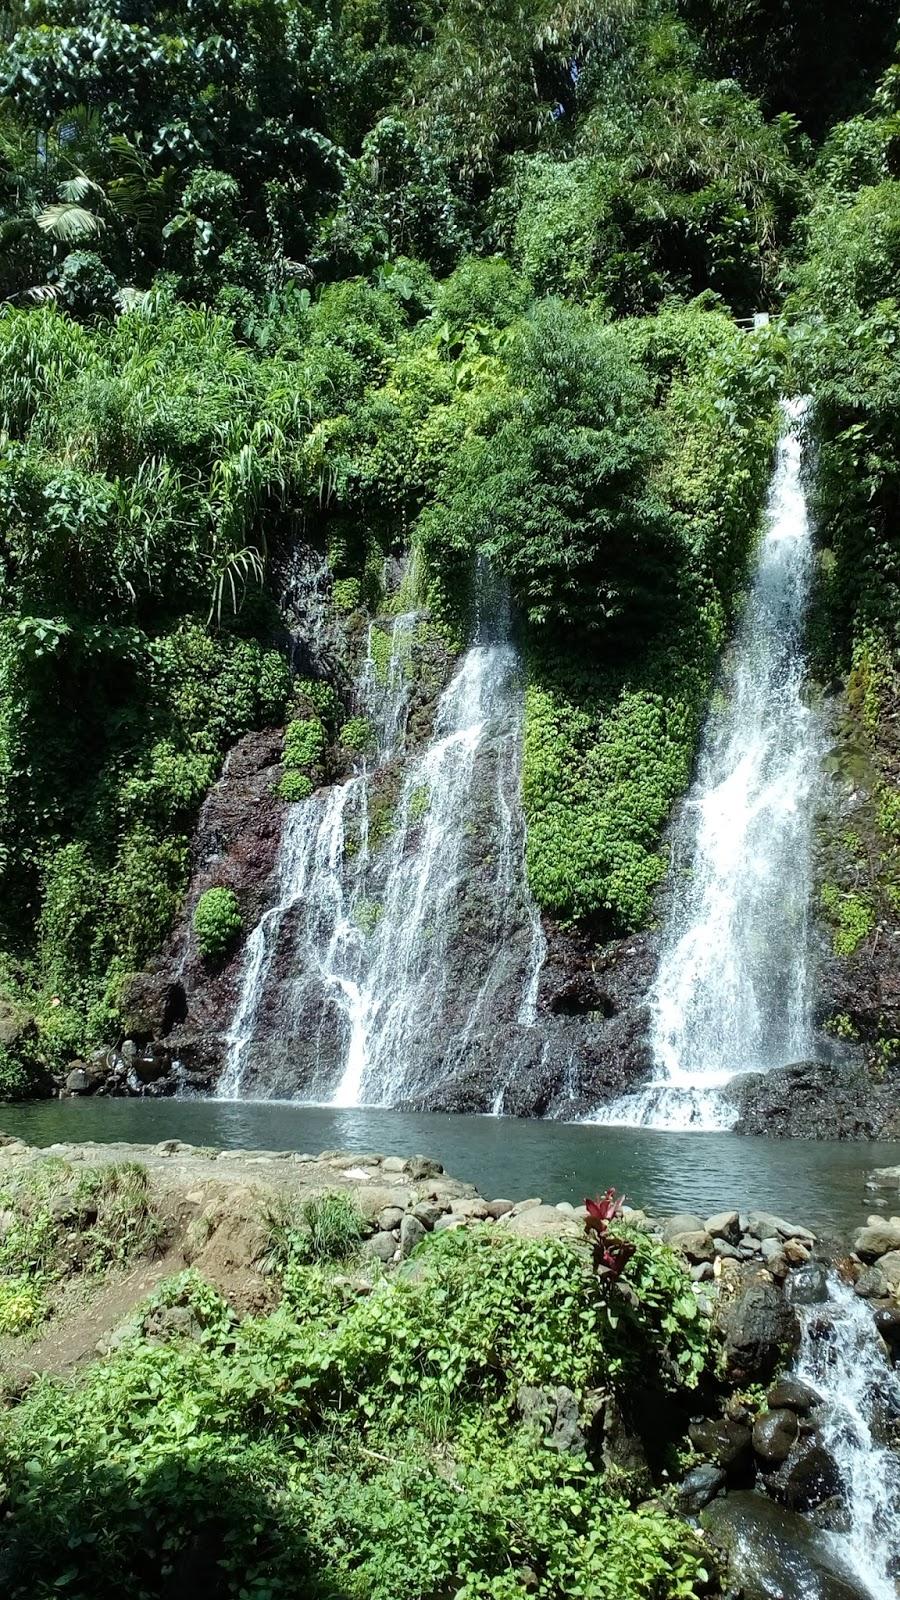 otak-atik kata: Wisata Air Terjun Kembar - Banyuwangi